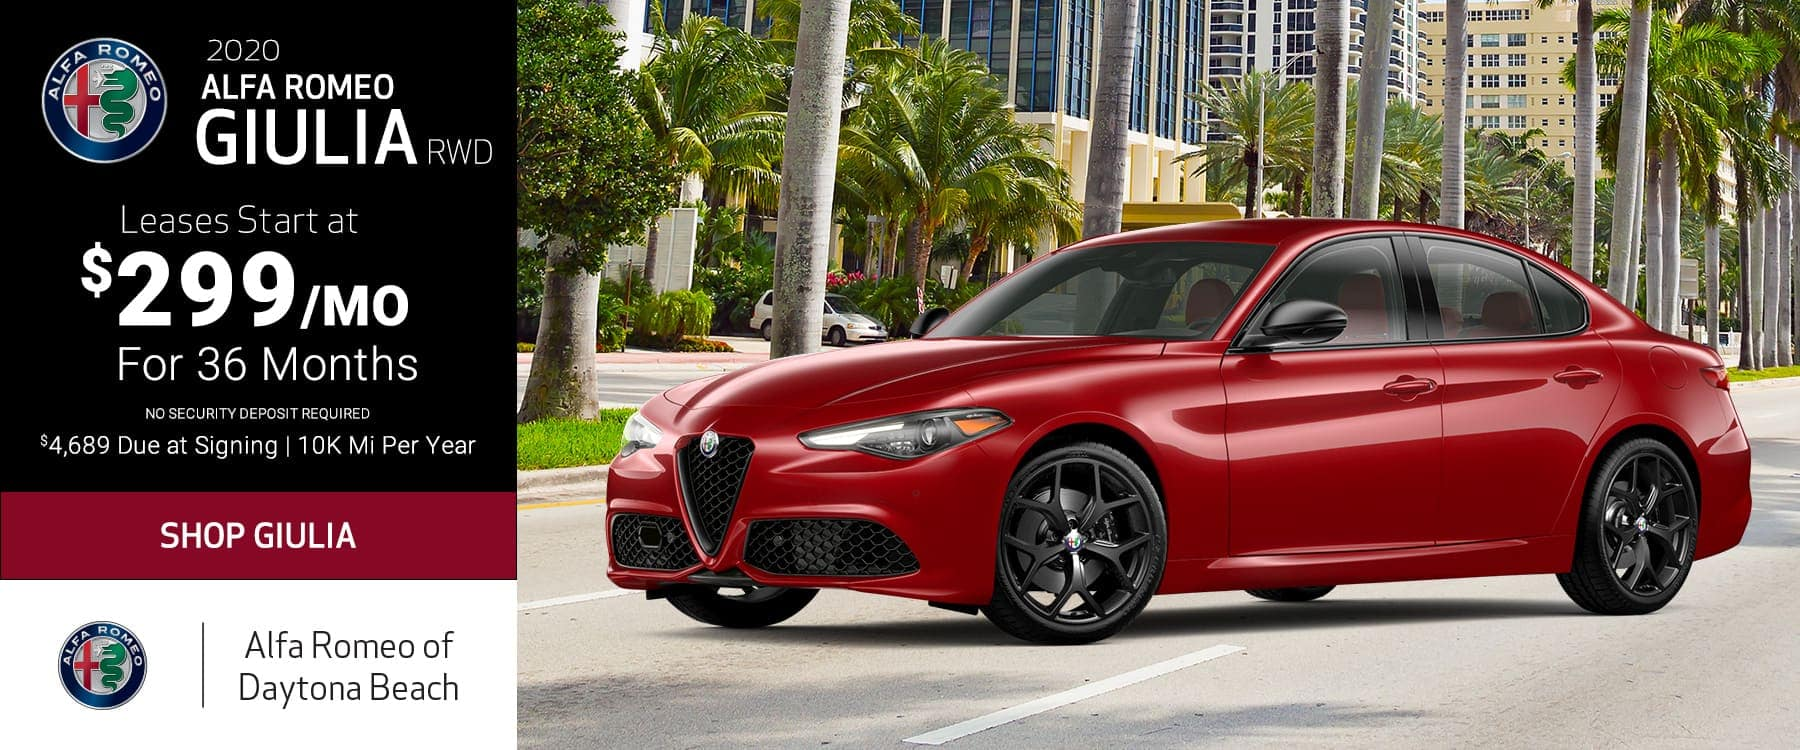 DMAR-2021-Alfa-Romeo-1800×750-01